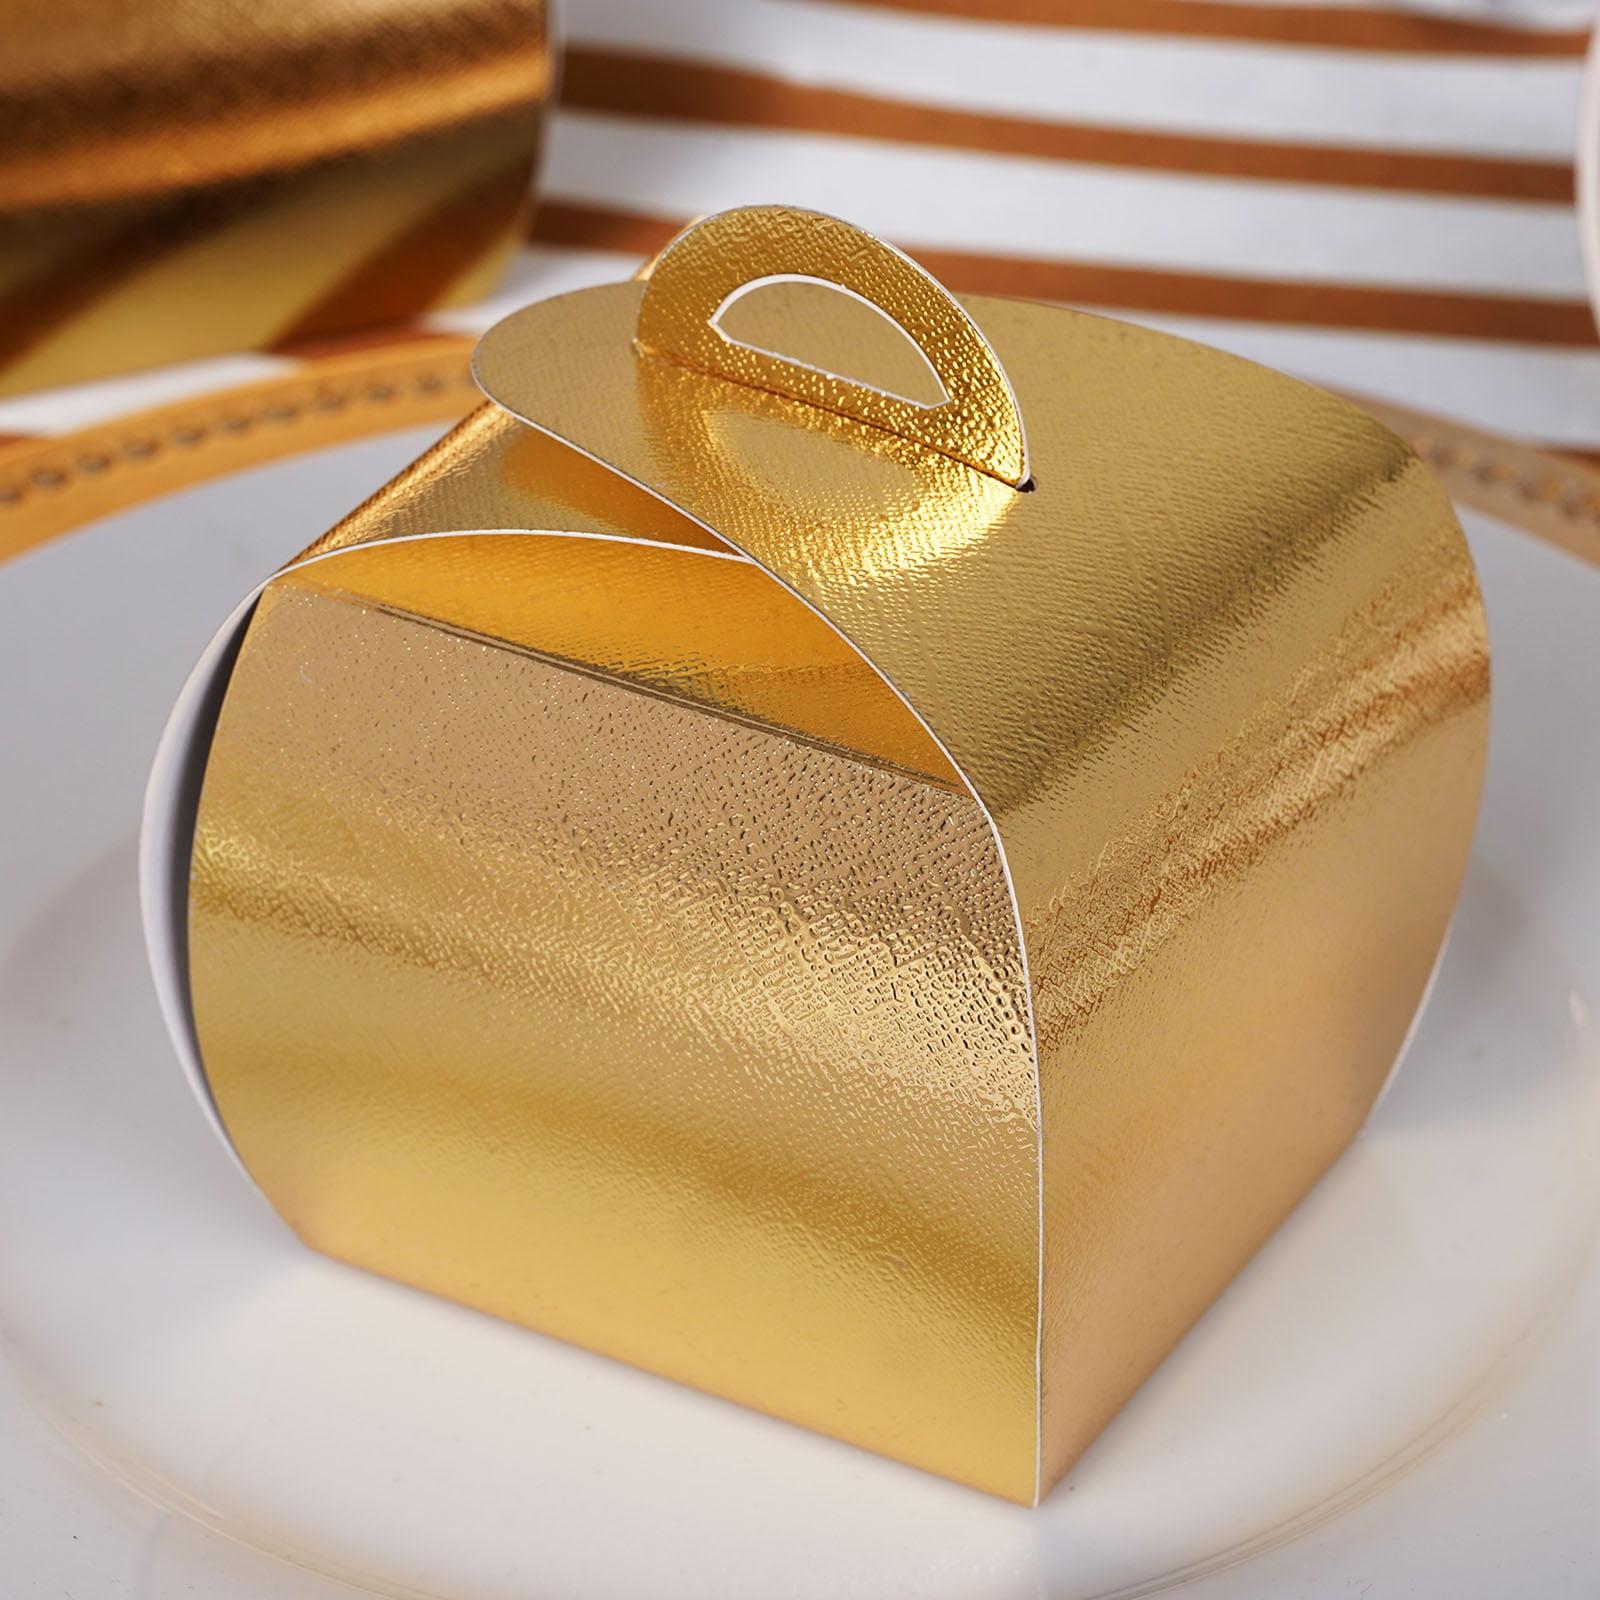 BalsaCircle 25 pcs CupCake Purse Wedding Favors Boxes - Wedding Party Candy Gifts Decorations Supplies